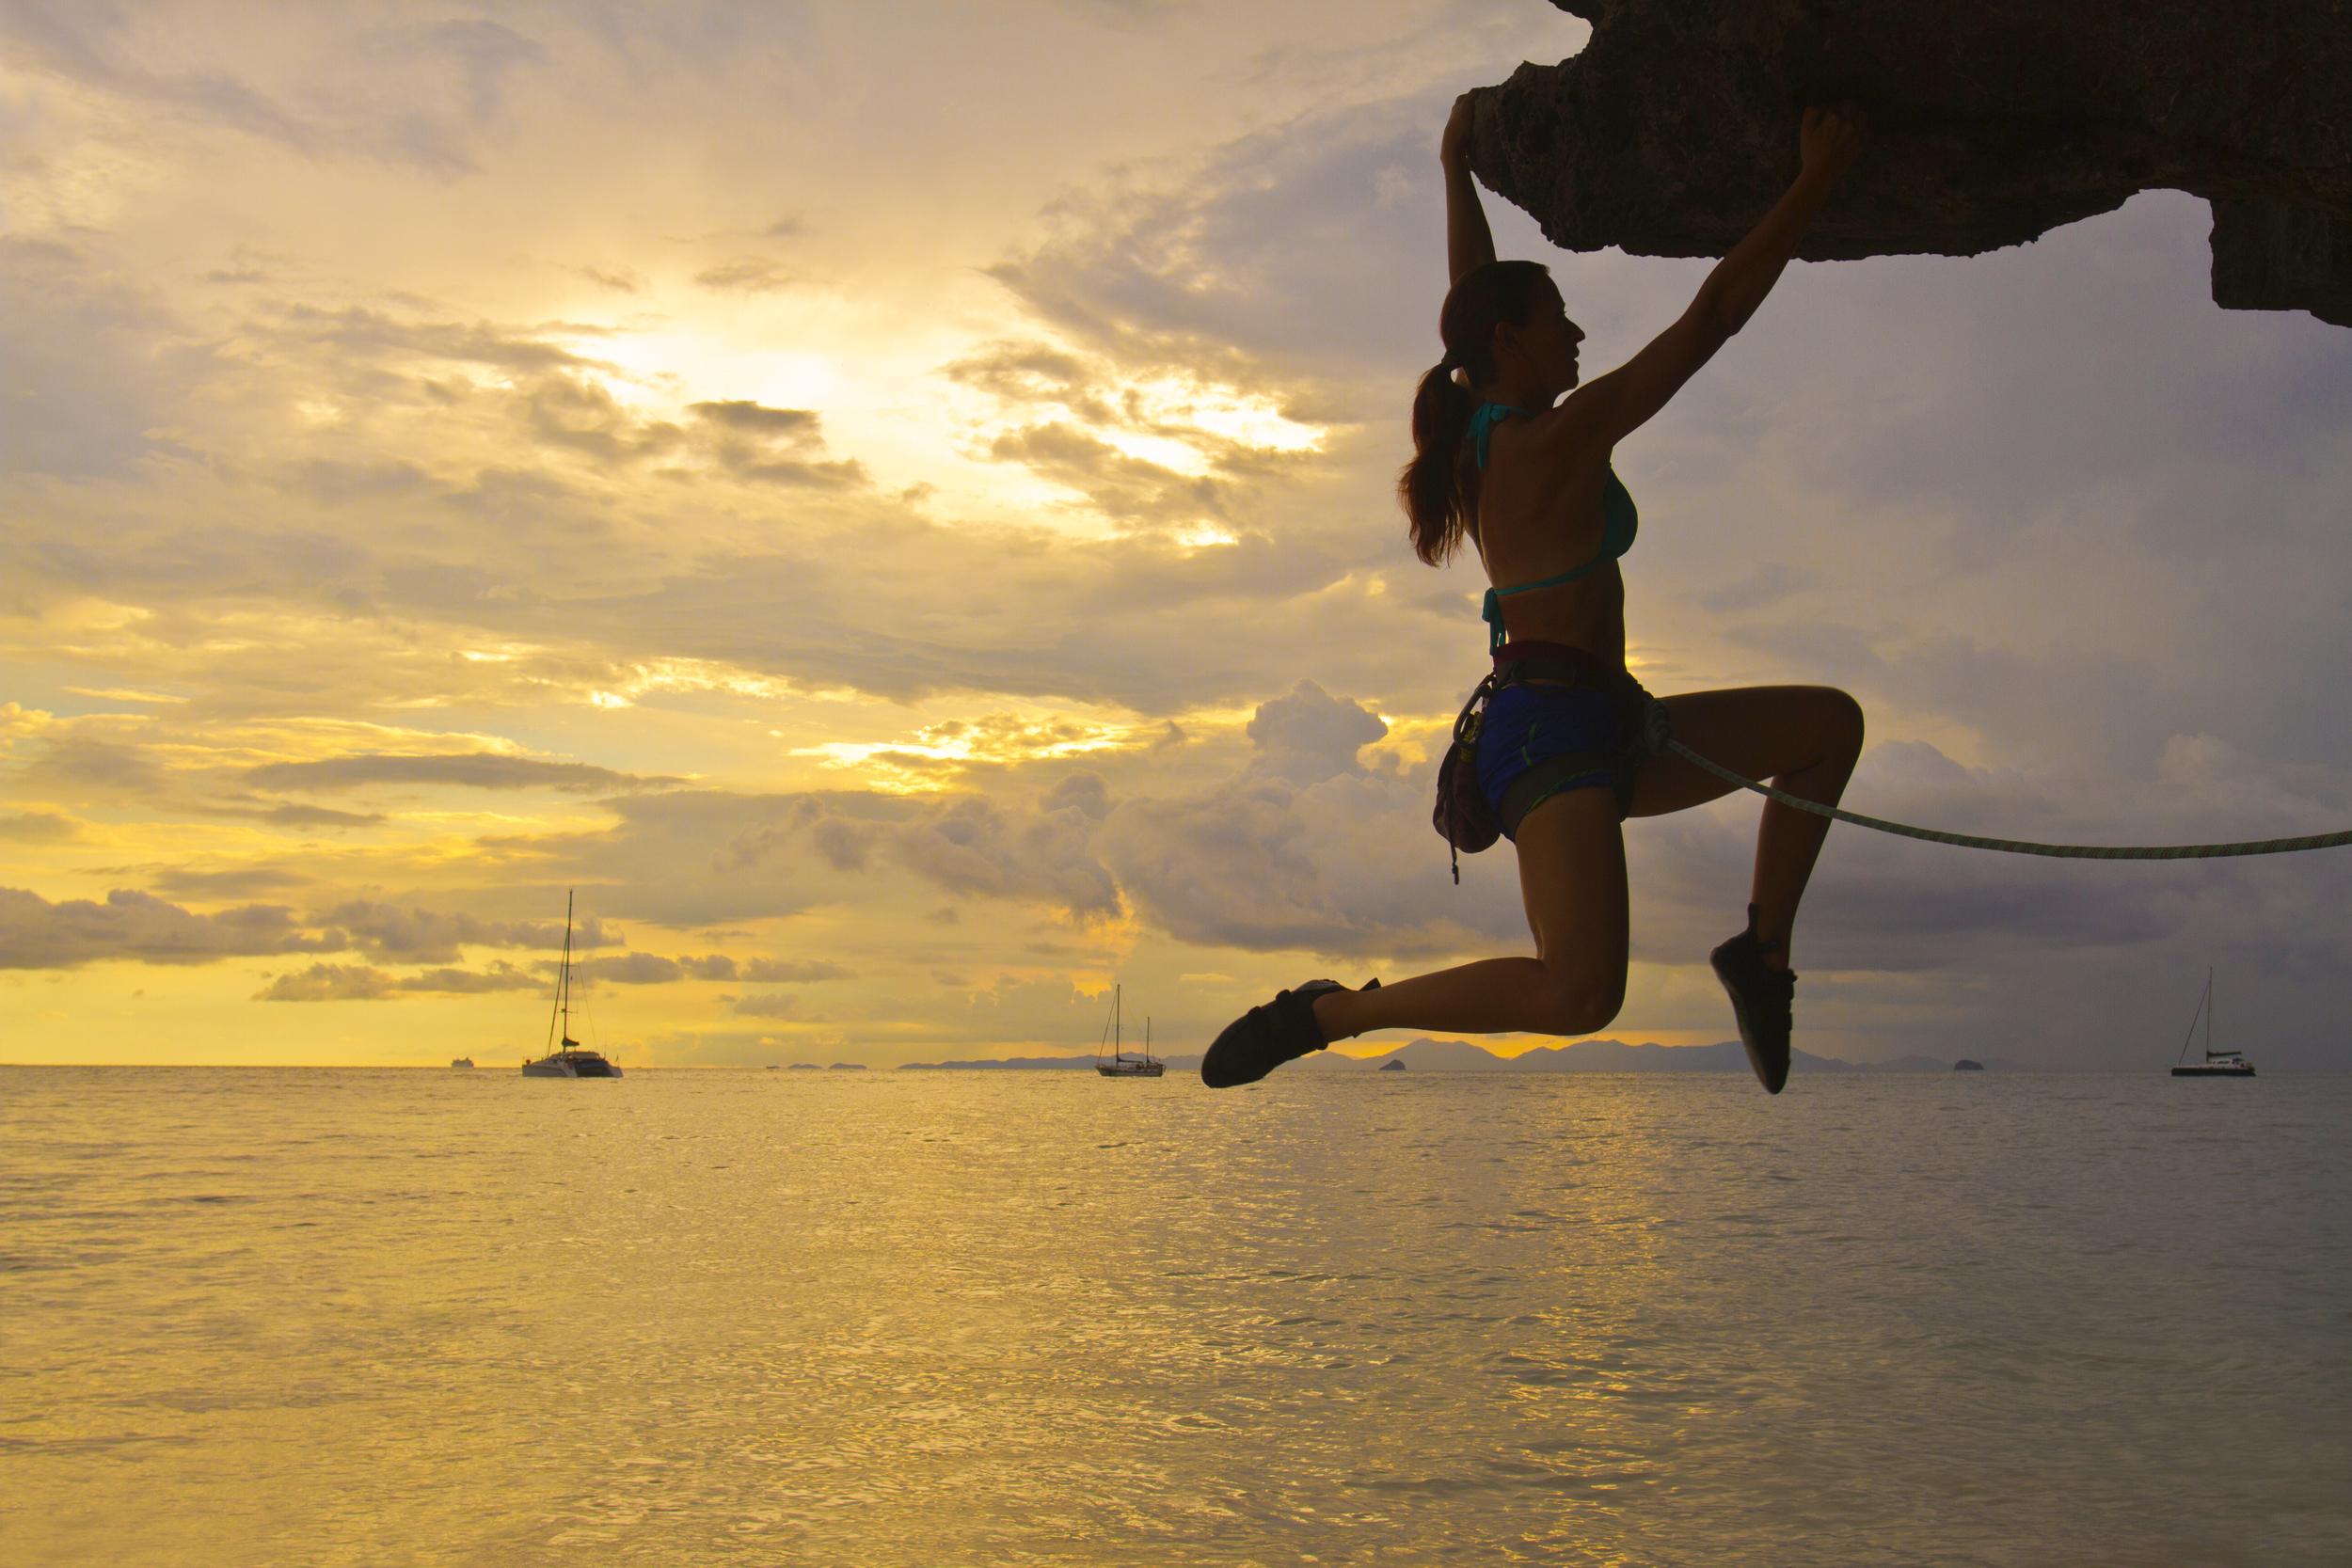 Woman Rock Climbing Silhouette